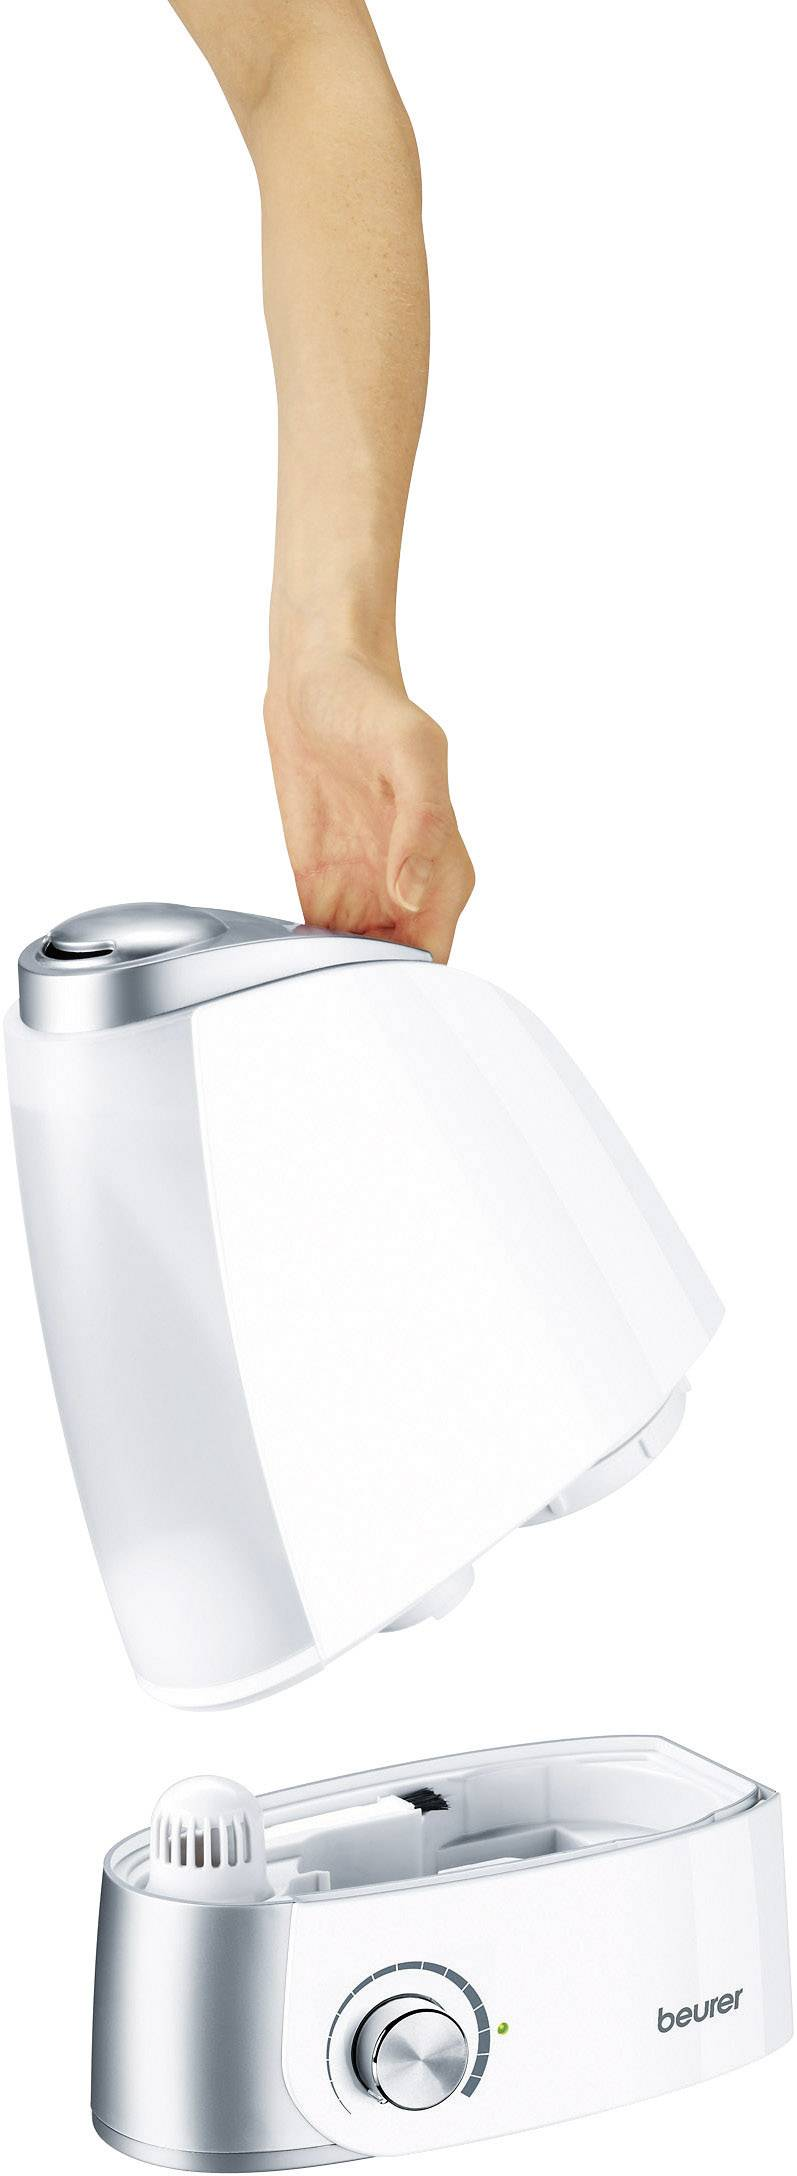 Beurer zvlhčovač vzduchu